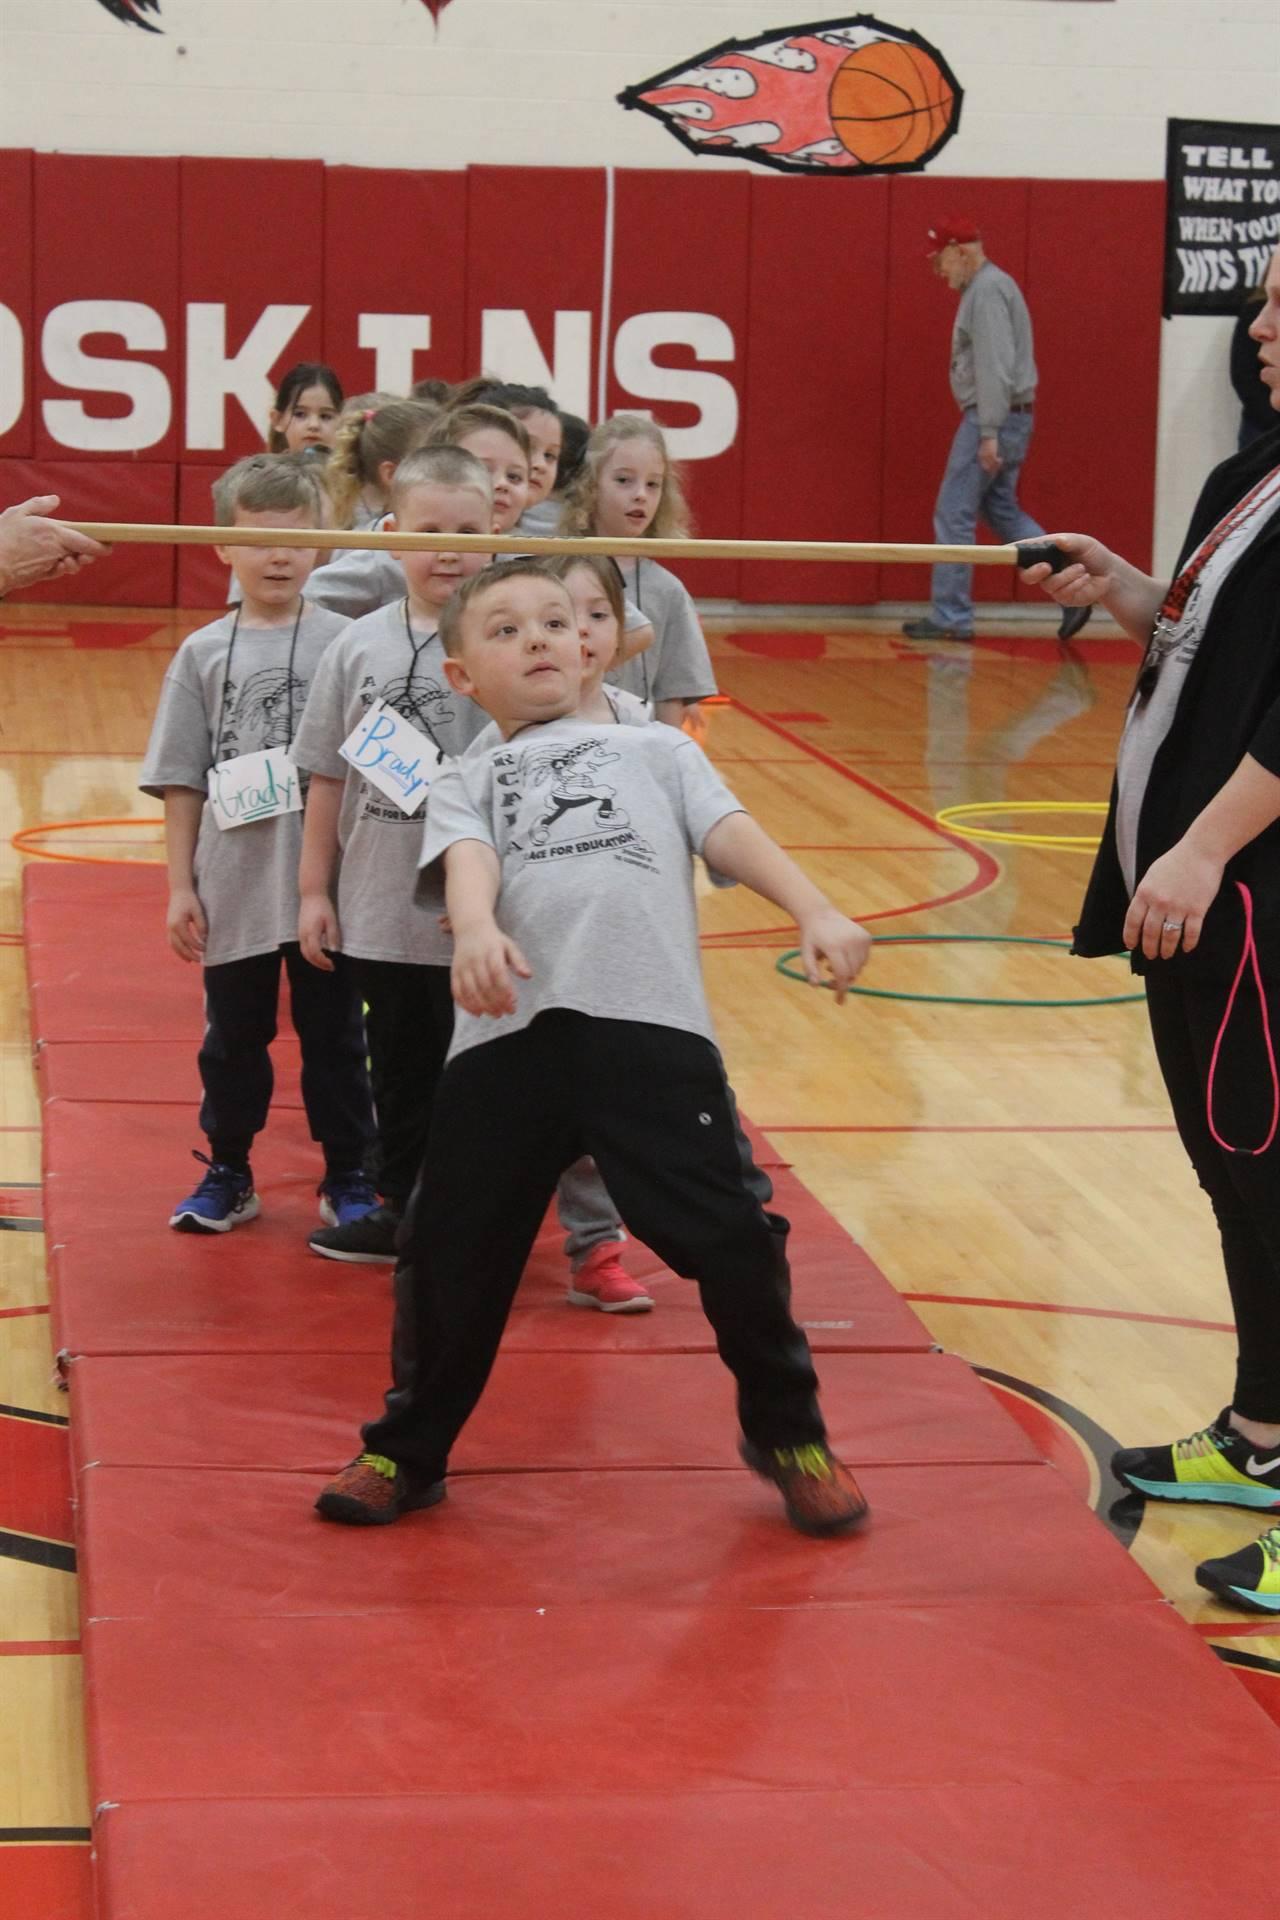 Kindergarten Limbo in the Race for Education